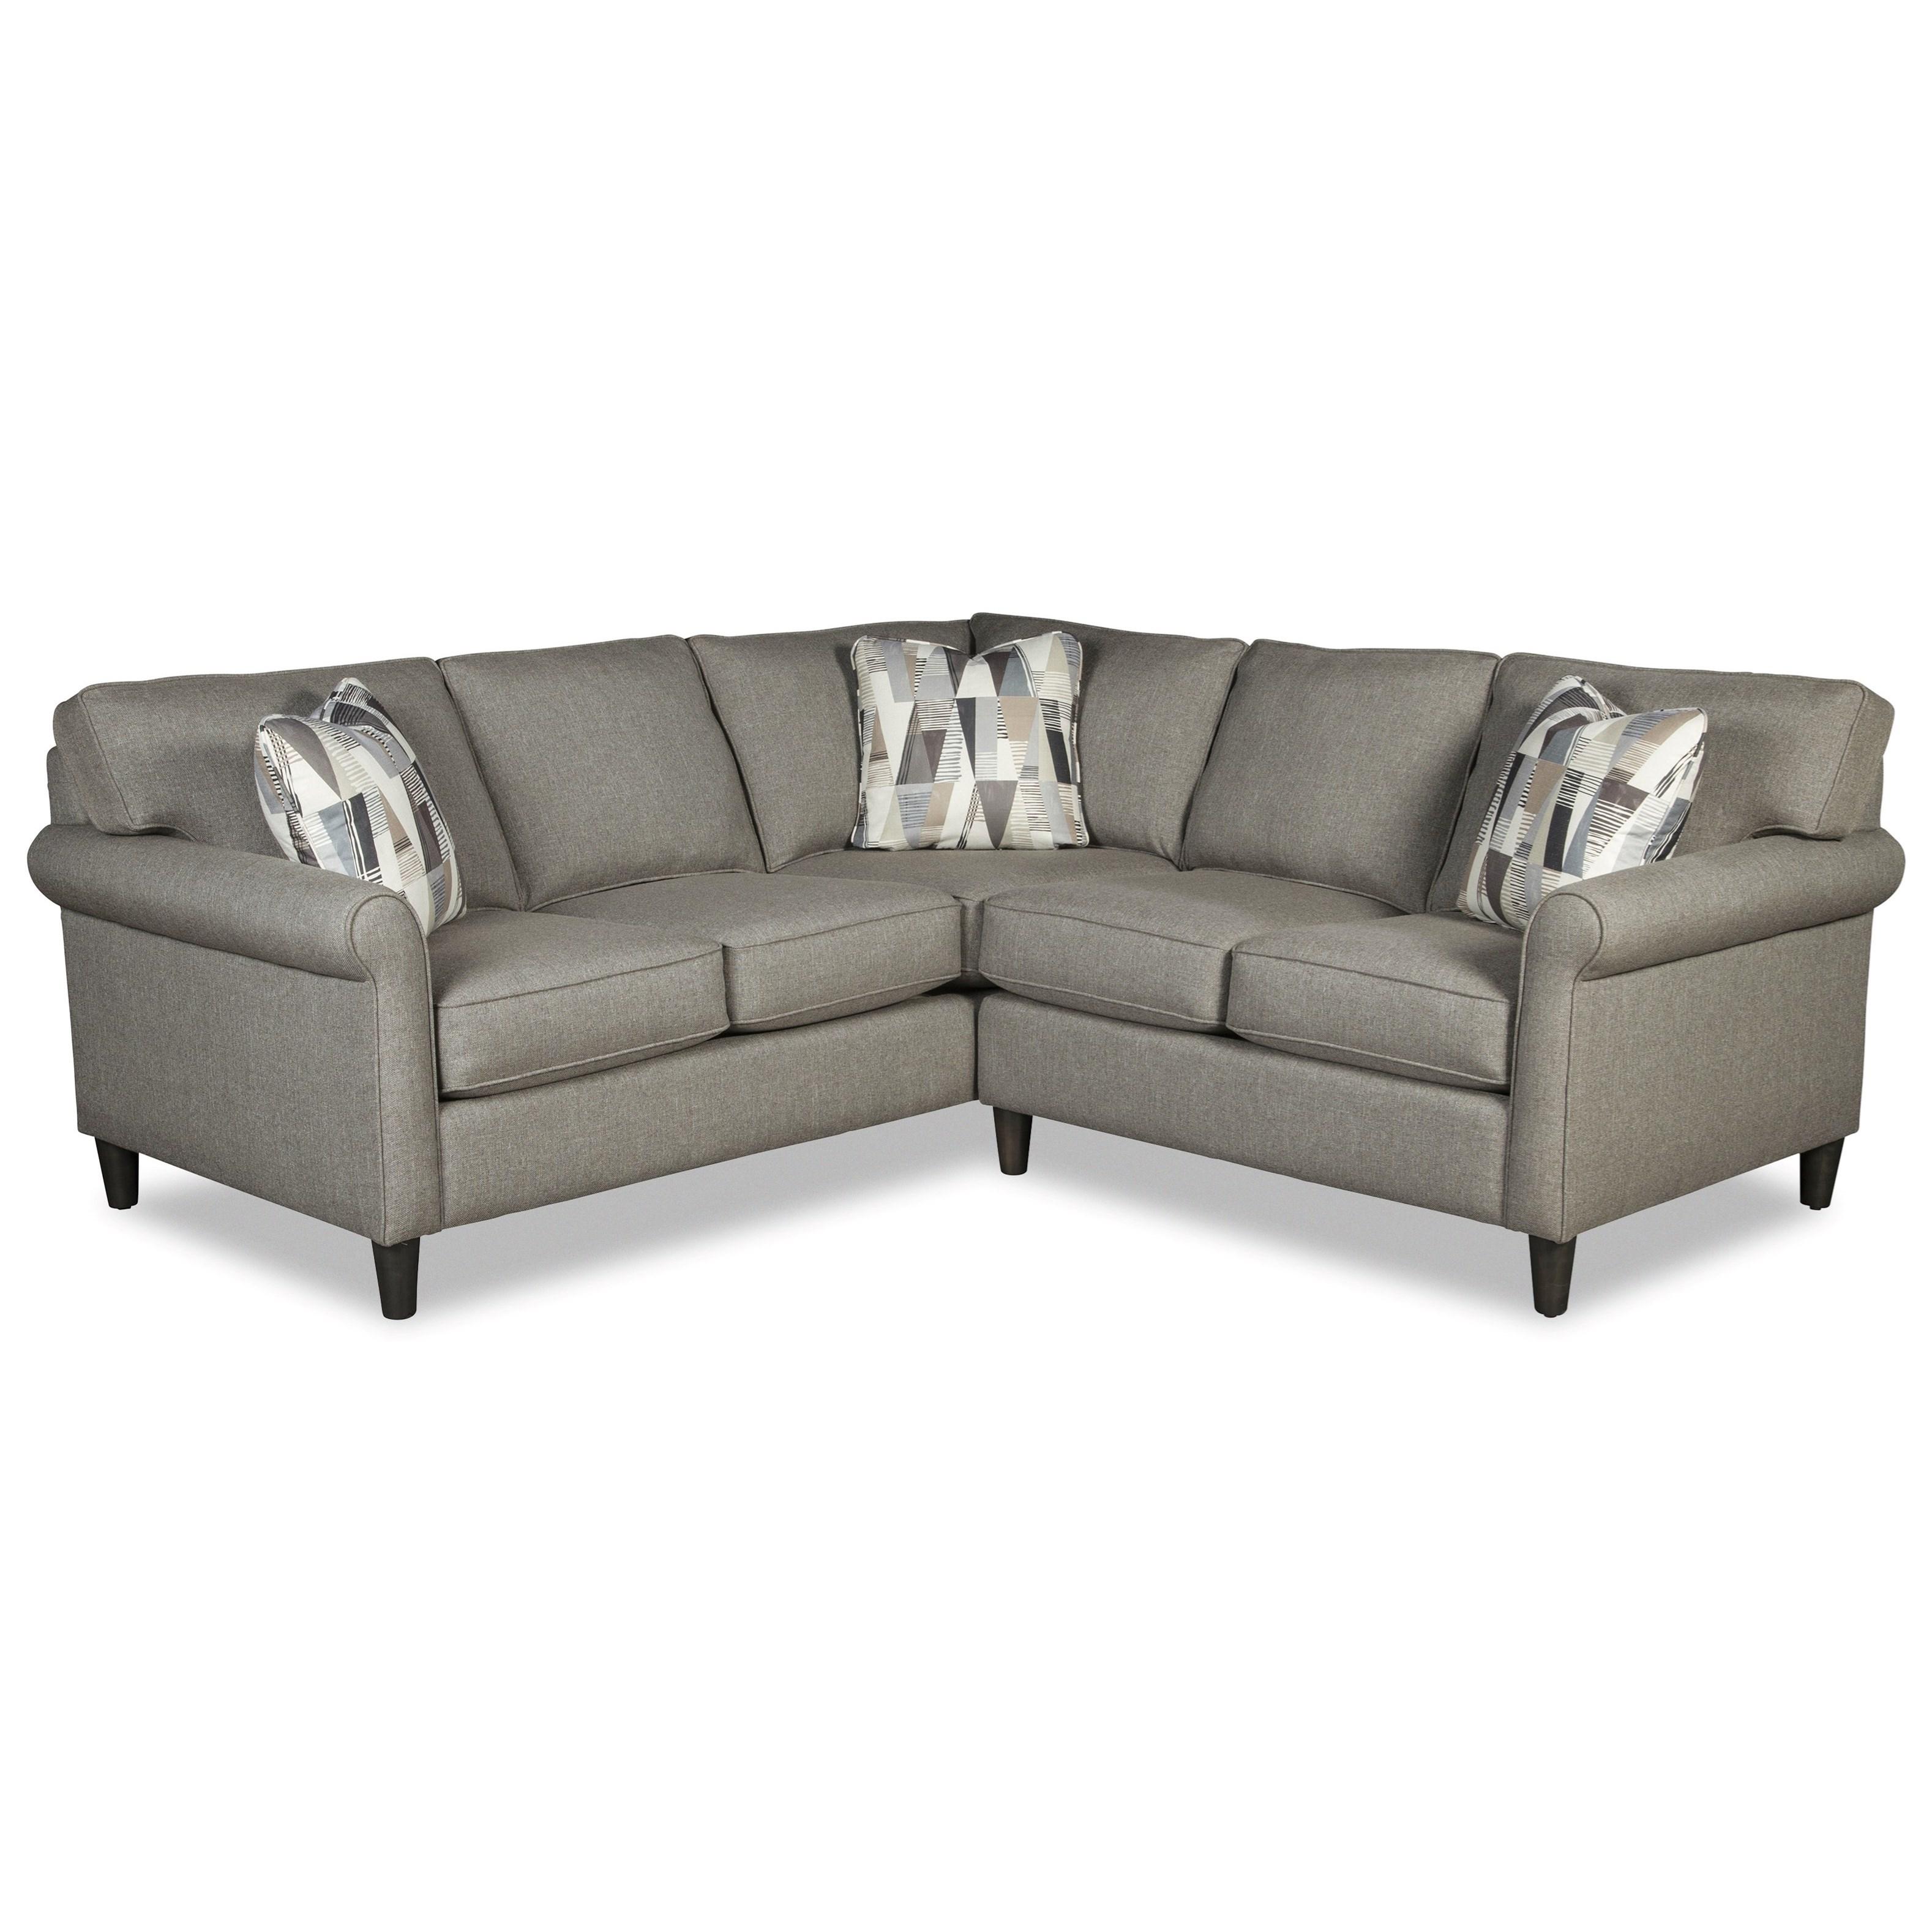 M9 Custom - Design Options 4-Seat Sectional Sofa w/ LAF Return Sofa by Craftmaster at Baer's Furniture